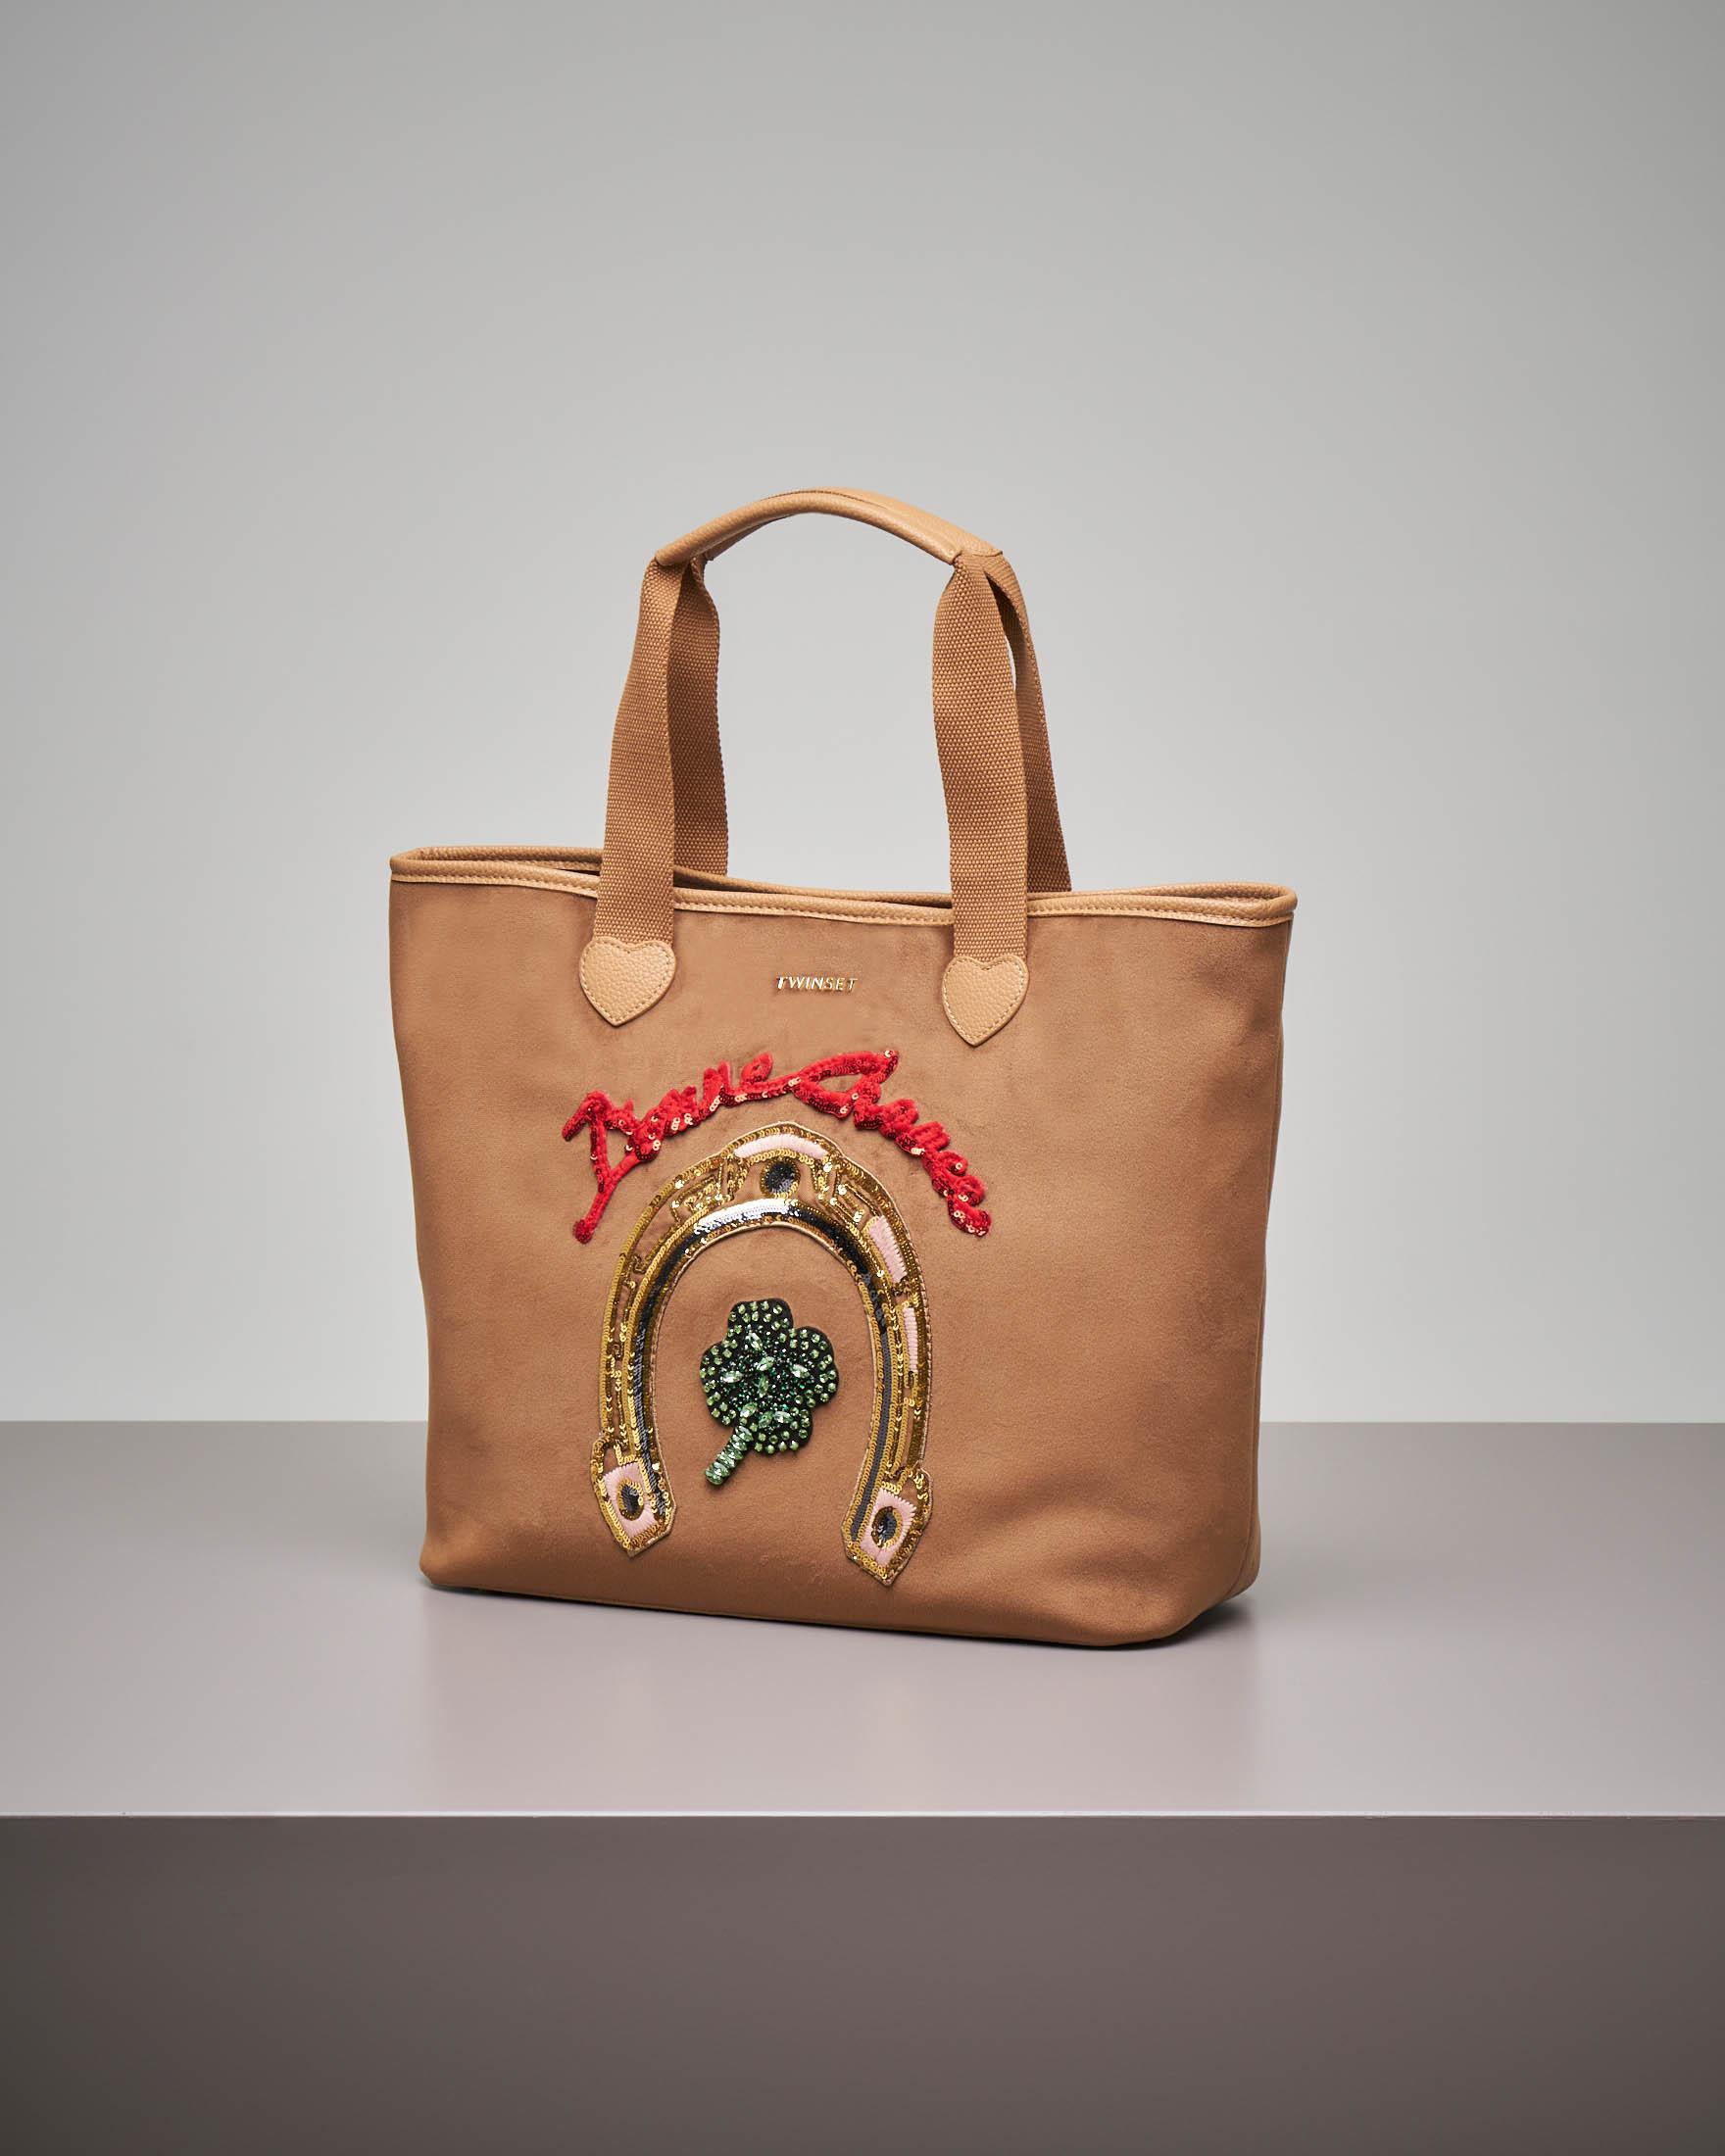 Shopping bag cammello in velluto con ricami in strass e paillettes